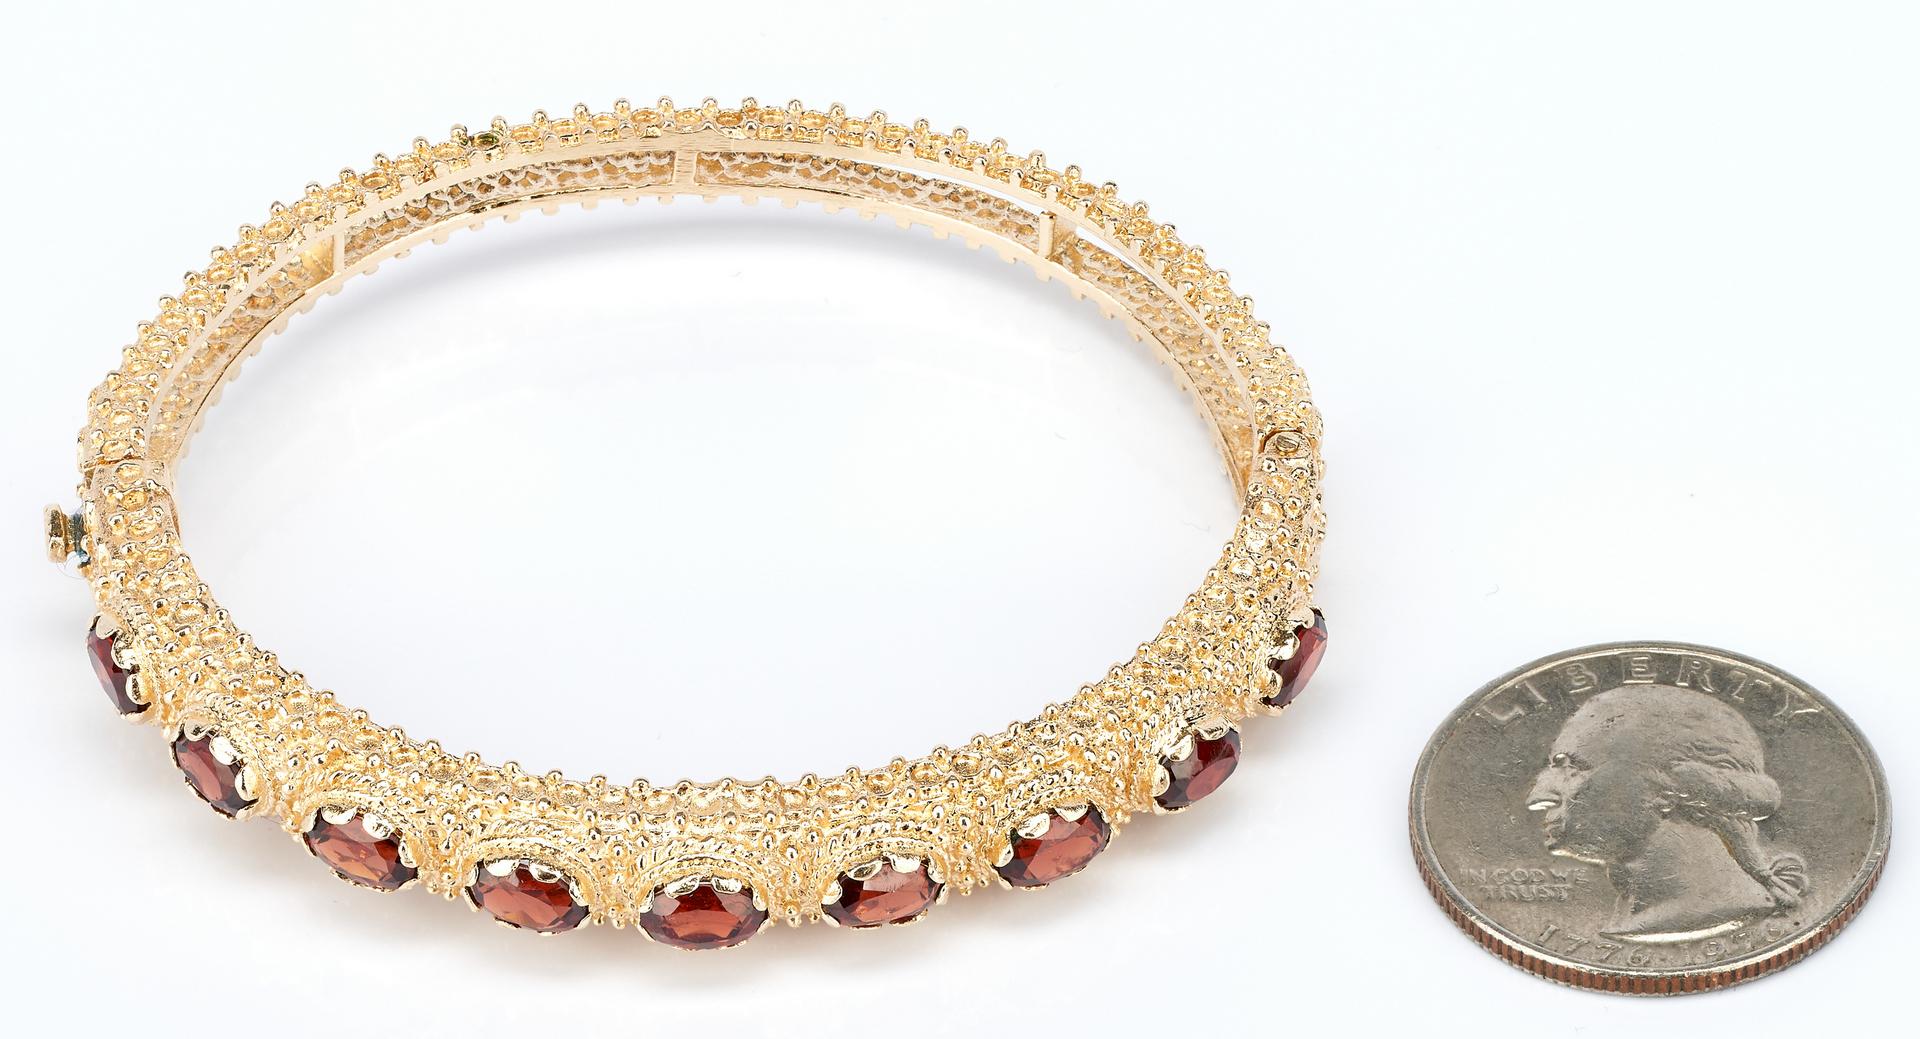 Lot 444: Ladies 14K Yellow Gold & Garnet Bangle Bracelet